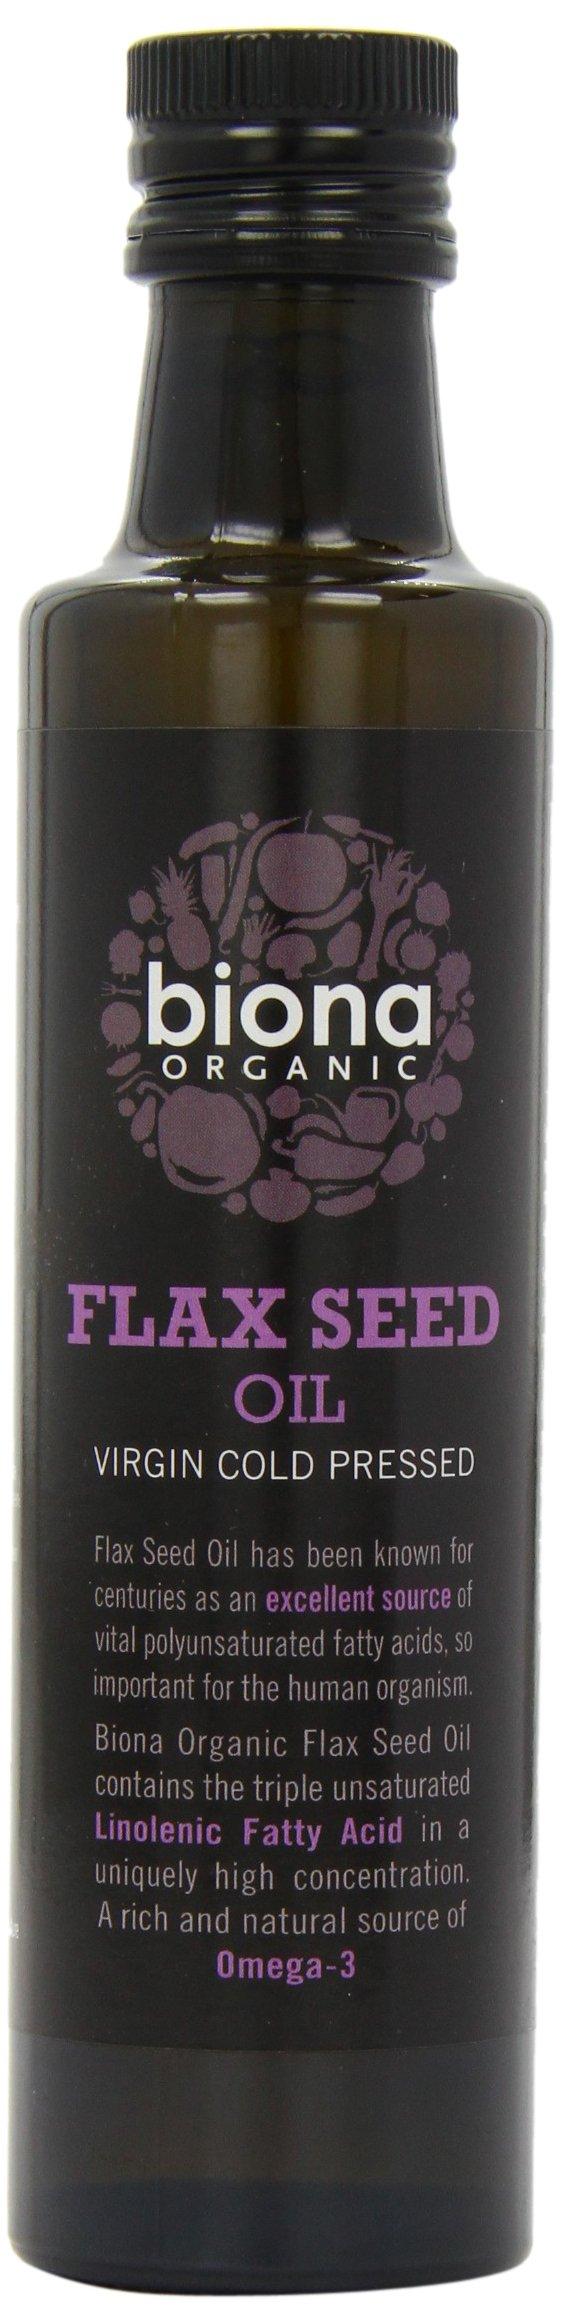 Biona Organic Cold Pressed Flax Oil (250ml) - Pack of 2 by Biona Organic